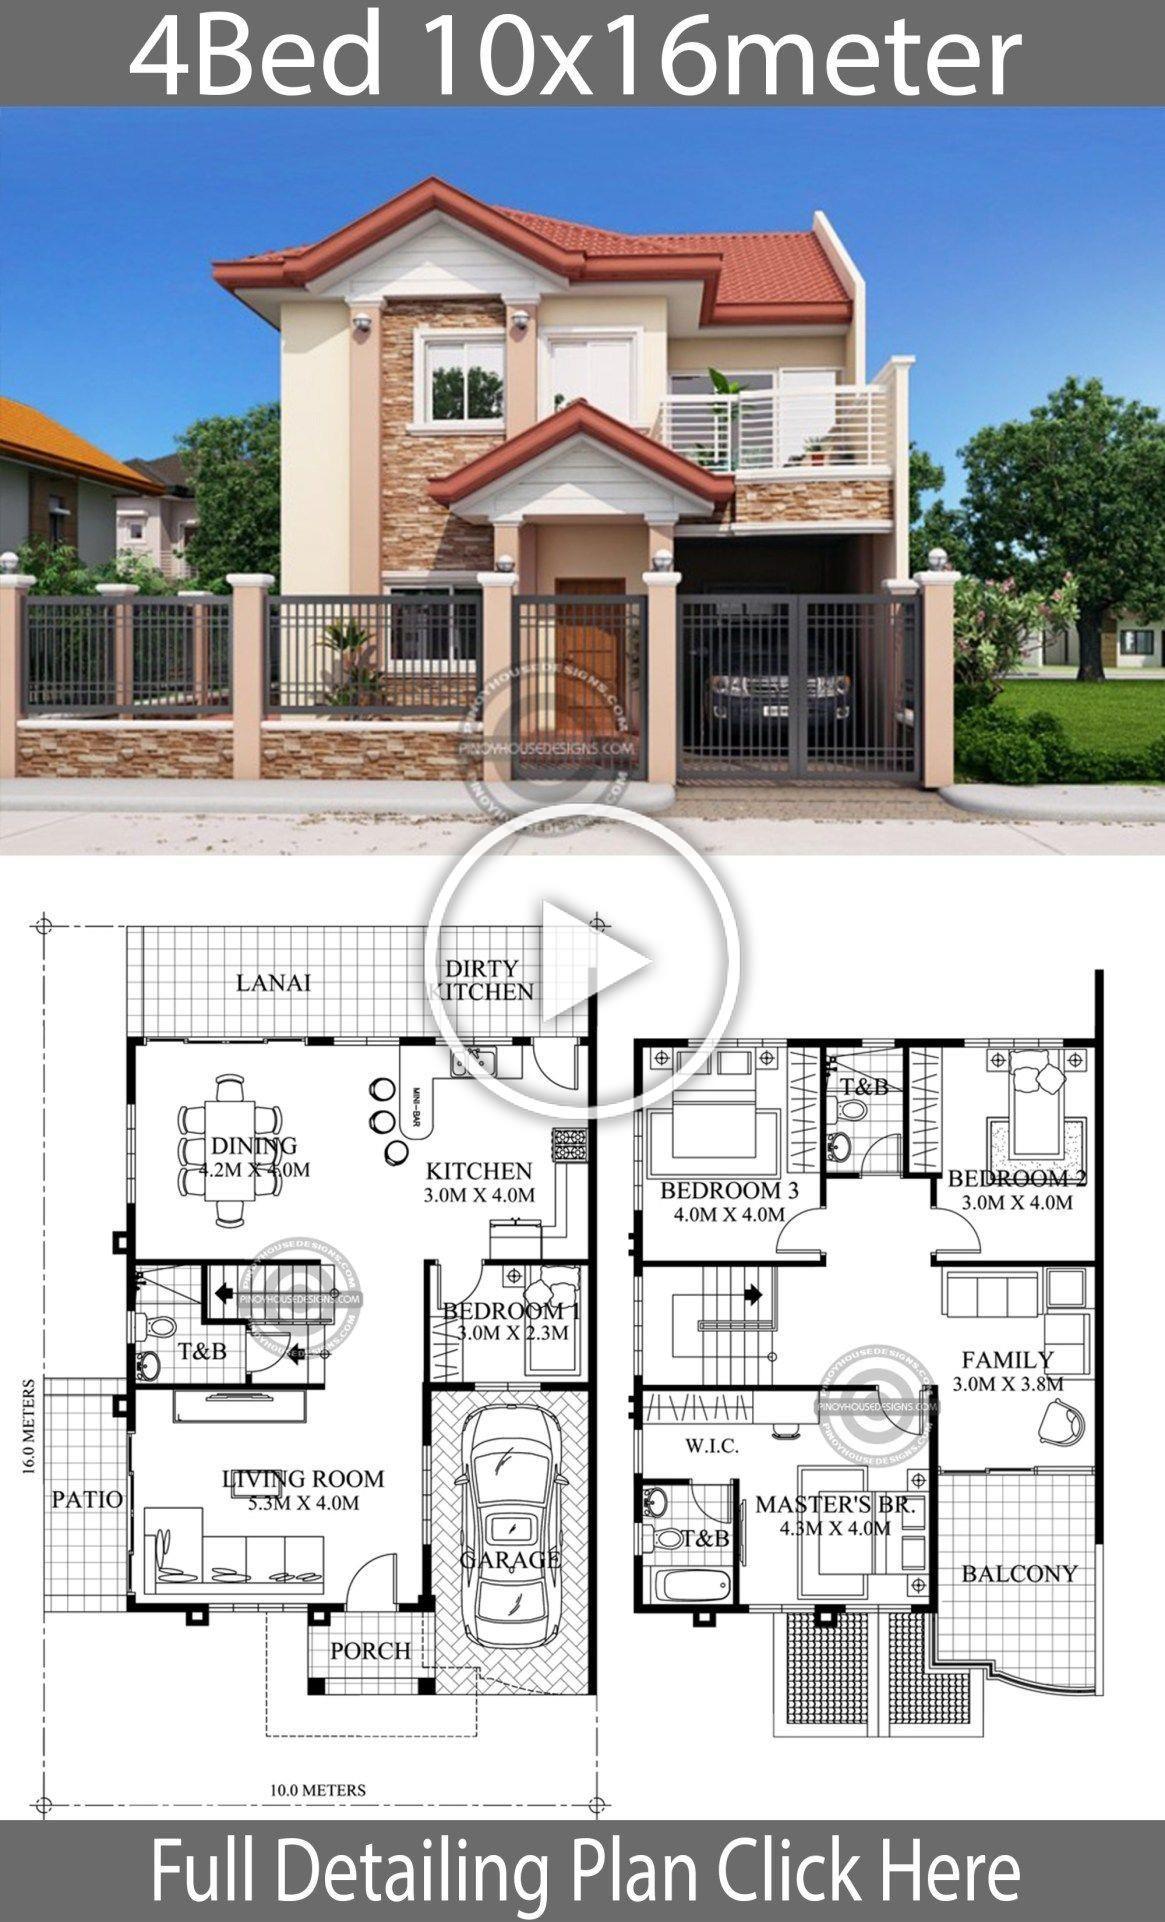 Home Design 10x16m 4 Bedrooms Home Design With Plansearch Mimarlik Ofisi Amerikan Evleri Ev Plani